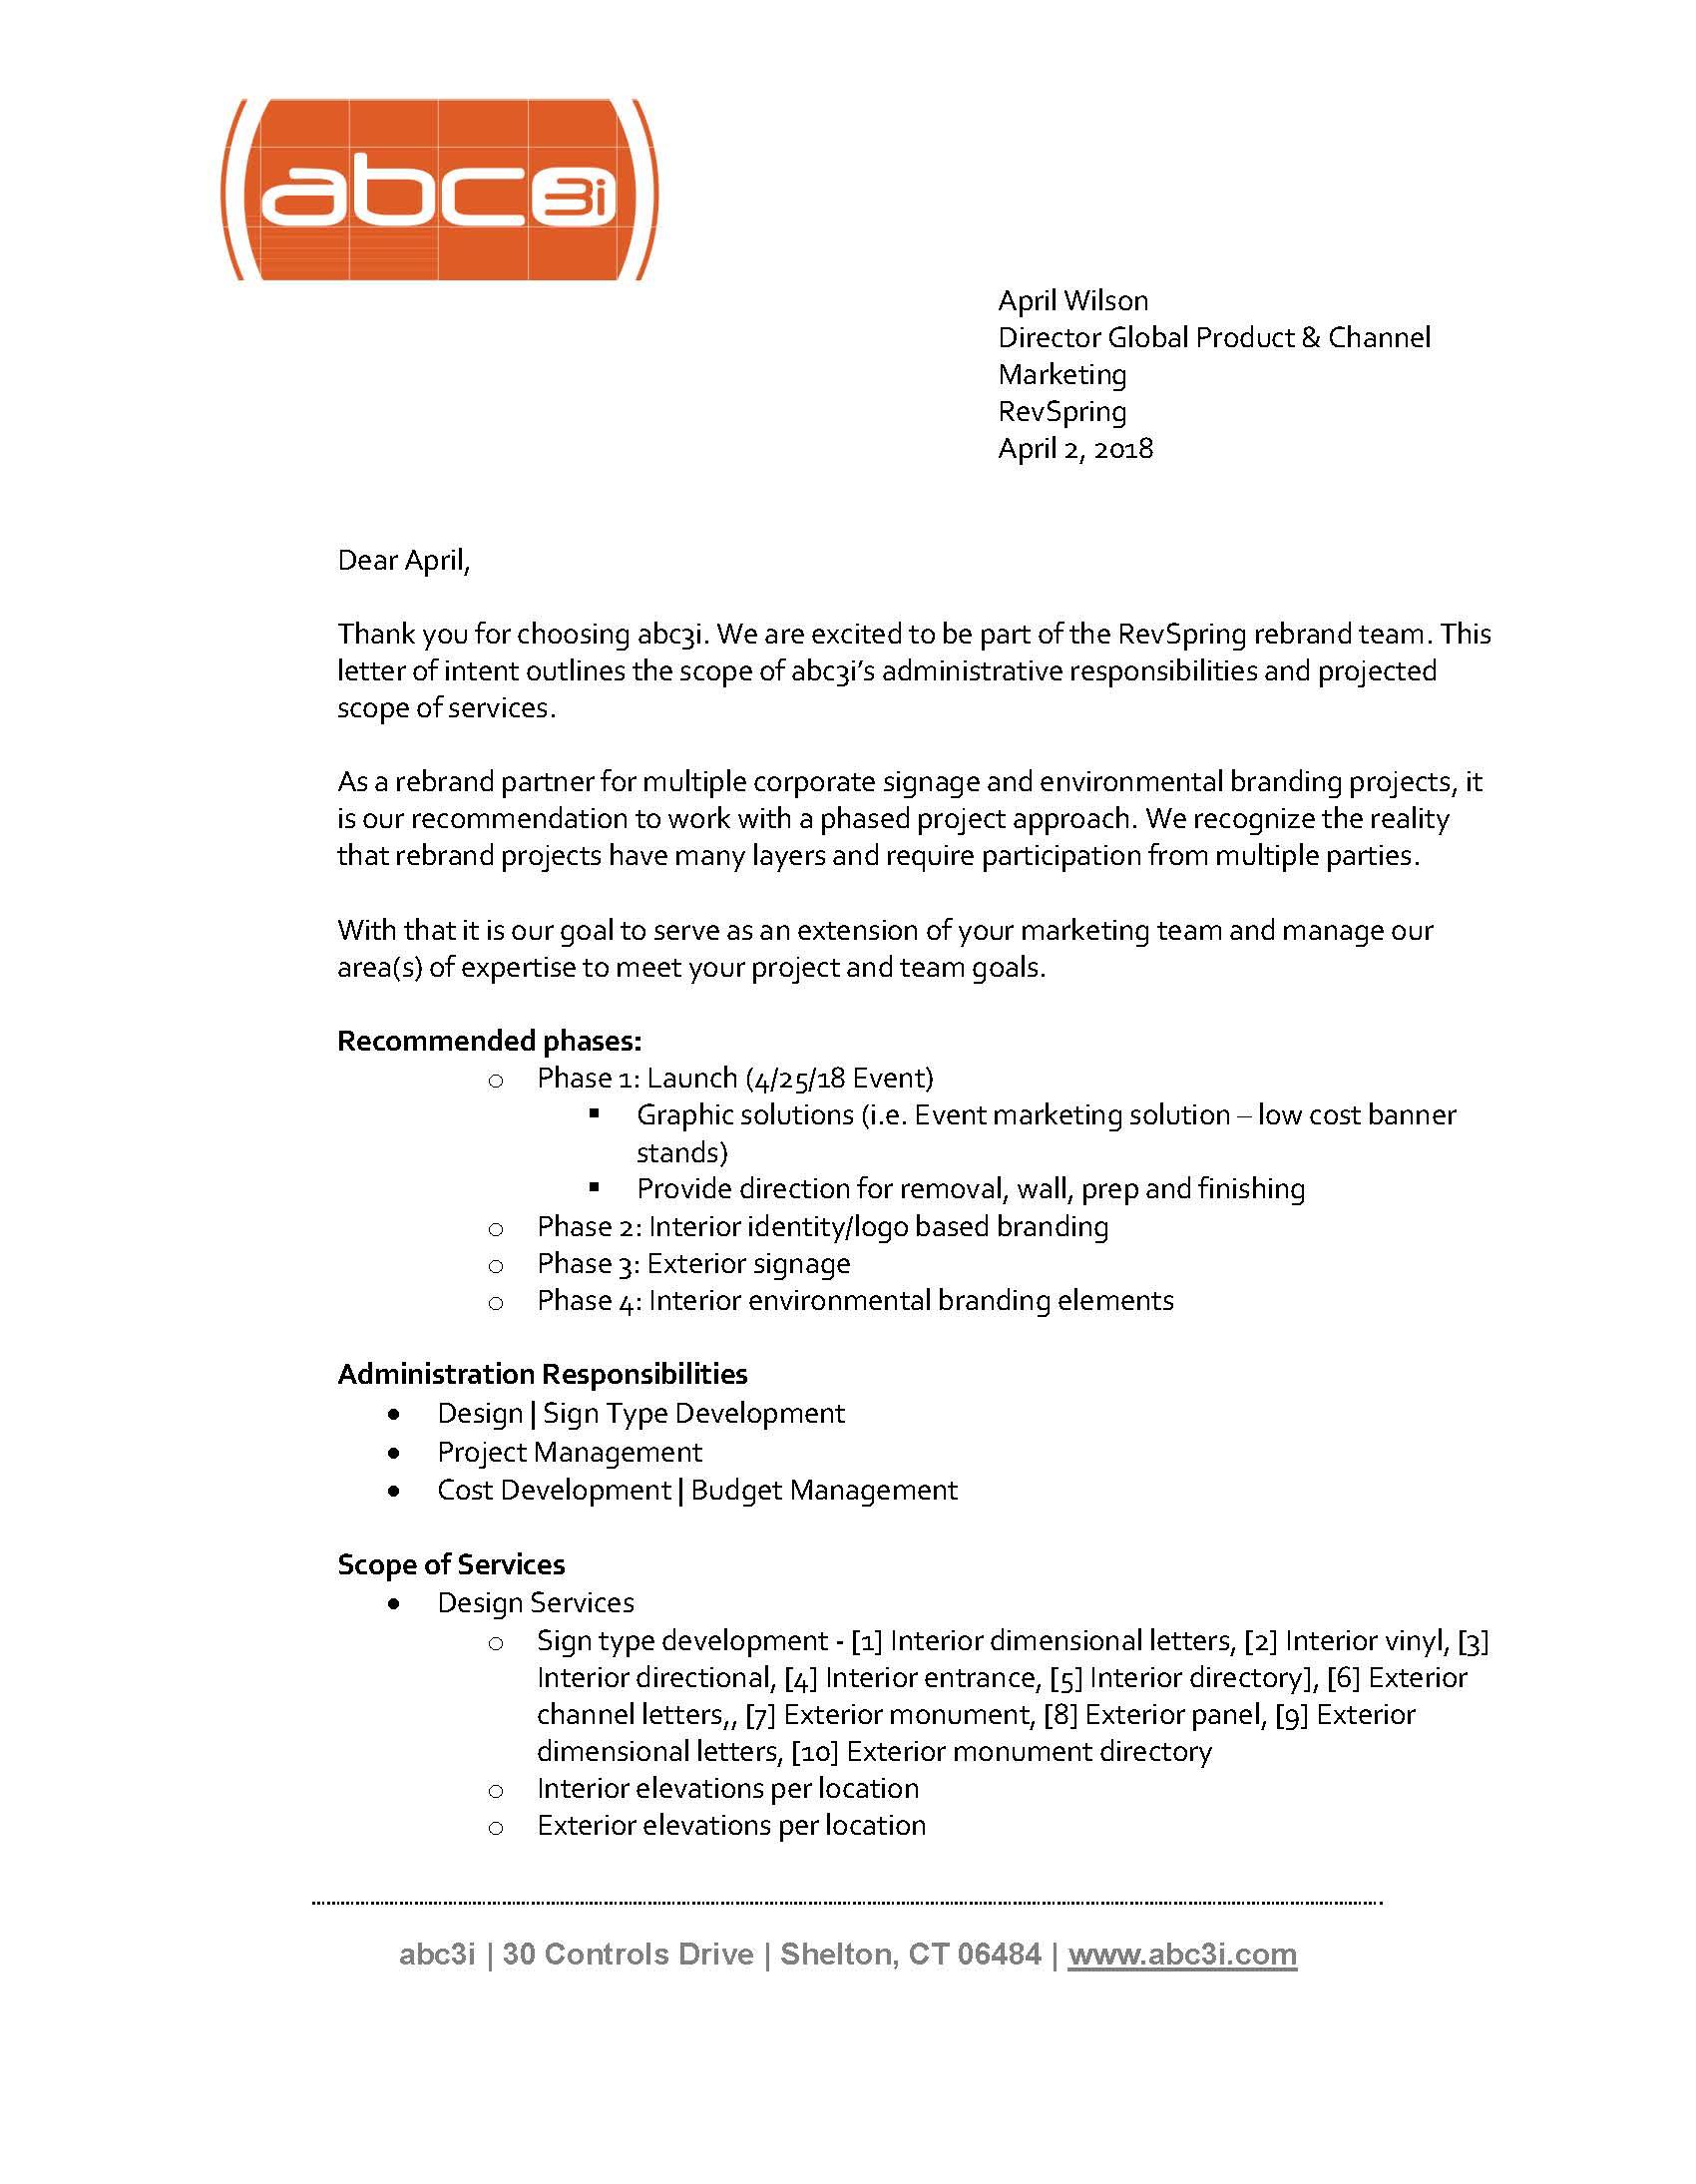 ABC3i_Rev Spring LOI (Draft) 3.30.18_Page_1.jpg